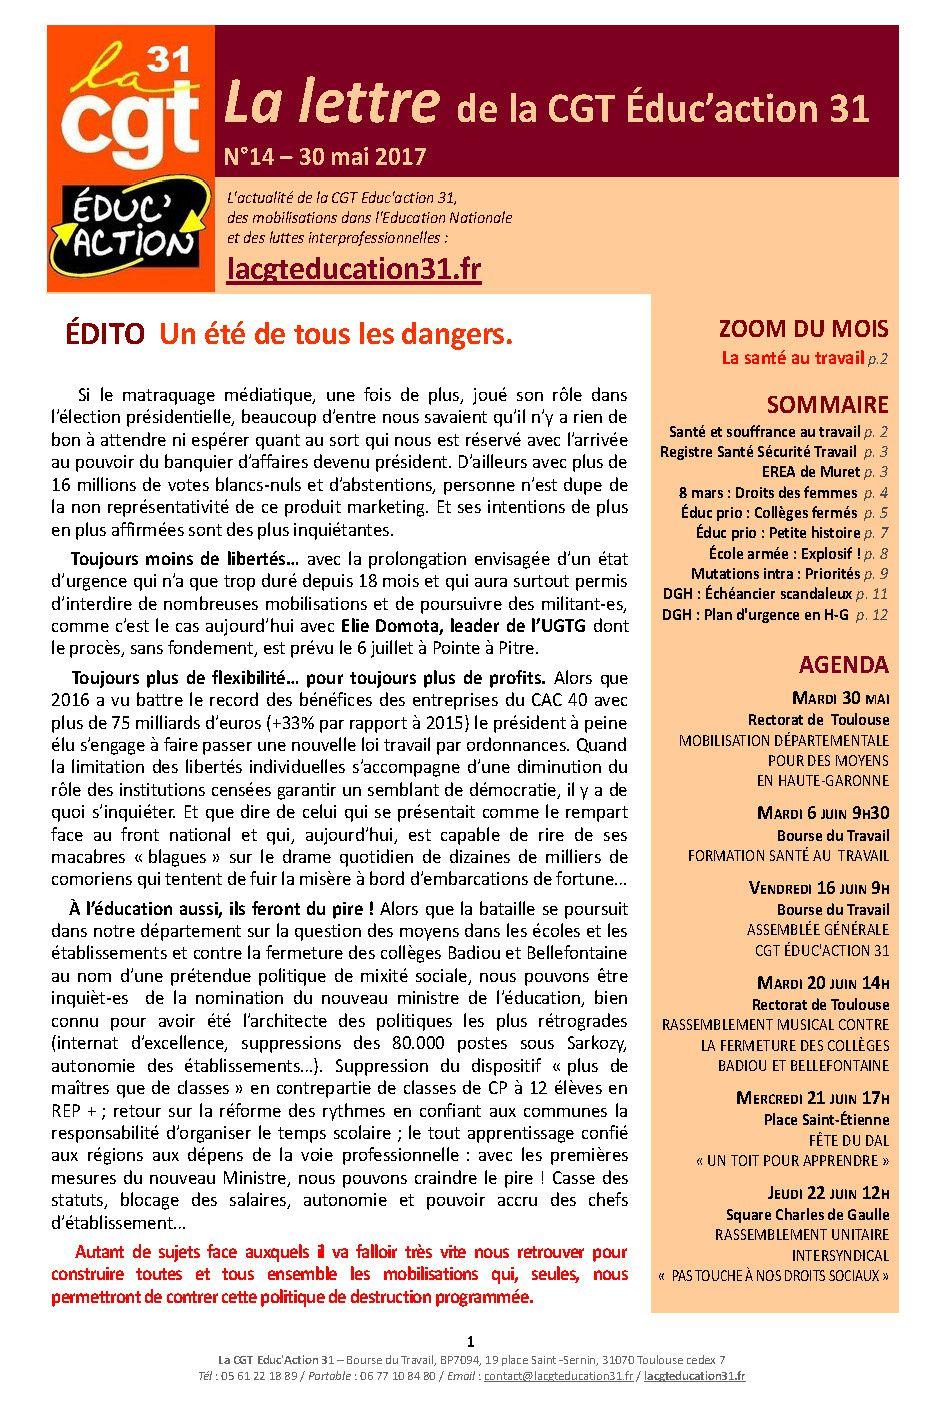 # La Lettre n°14 de la CGT Educ'action 31.